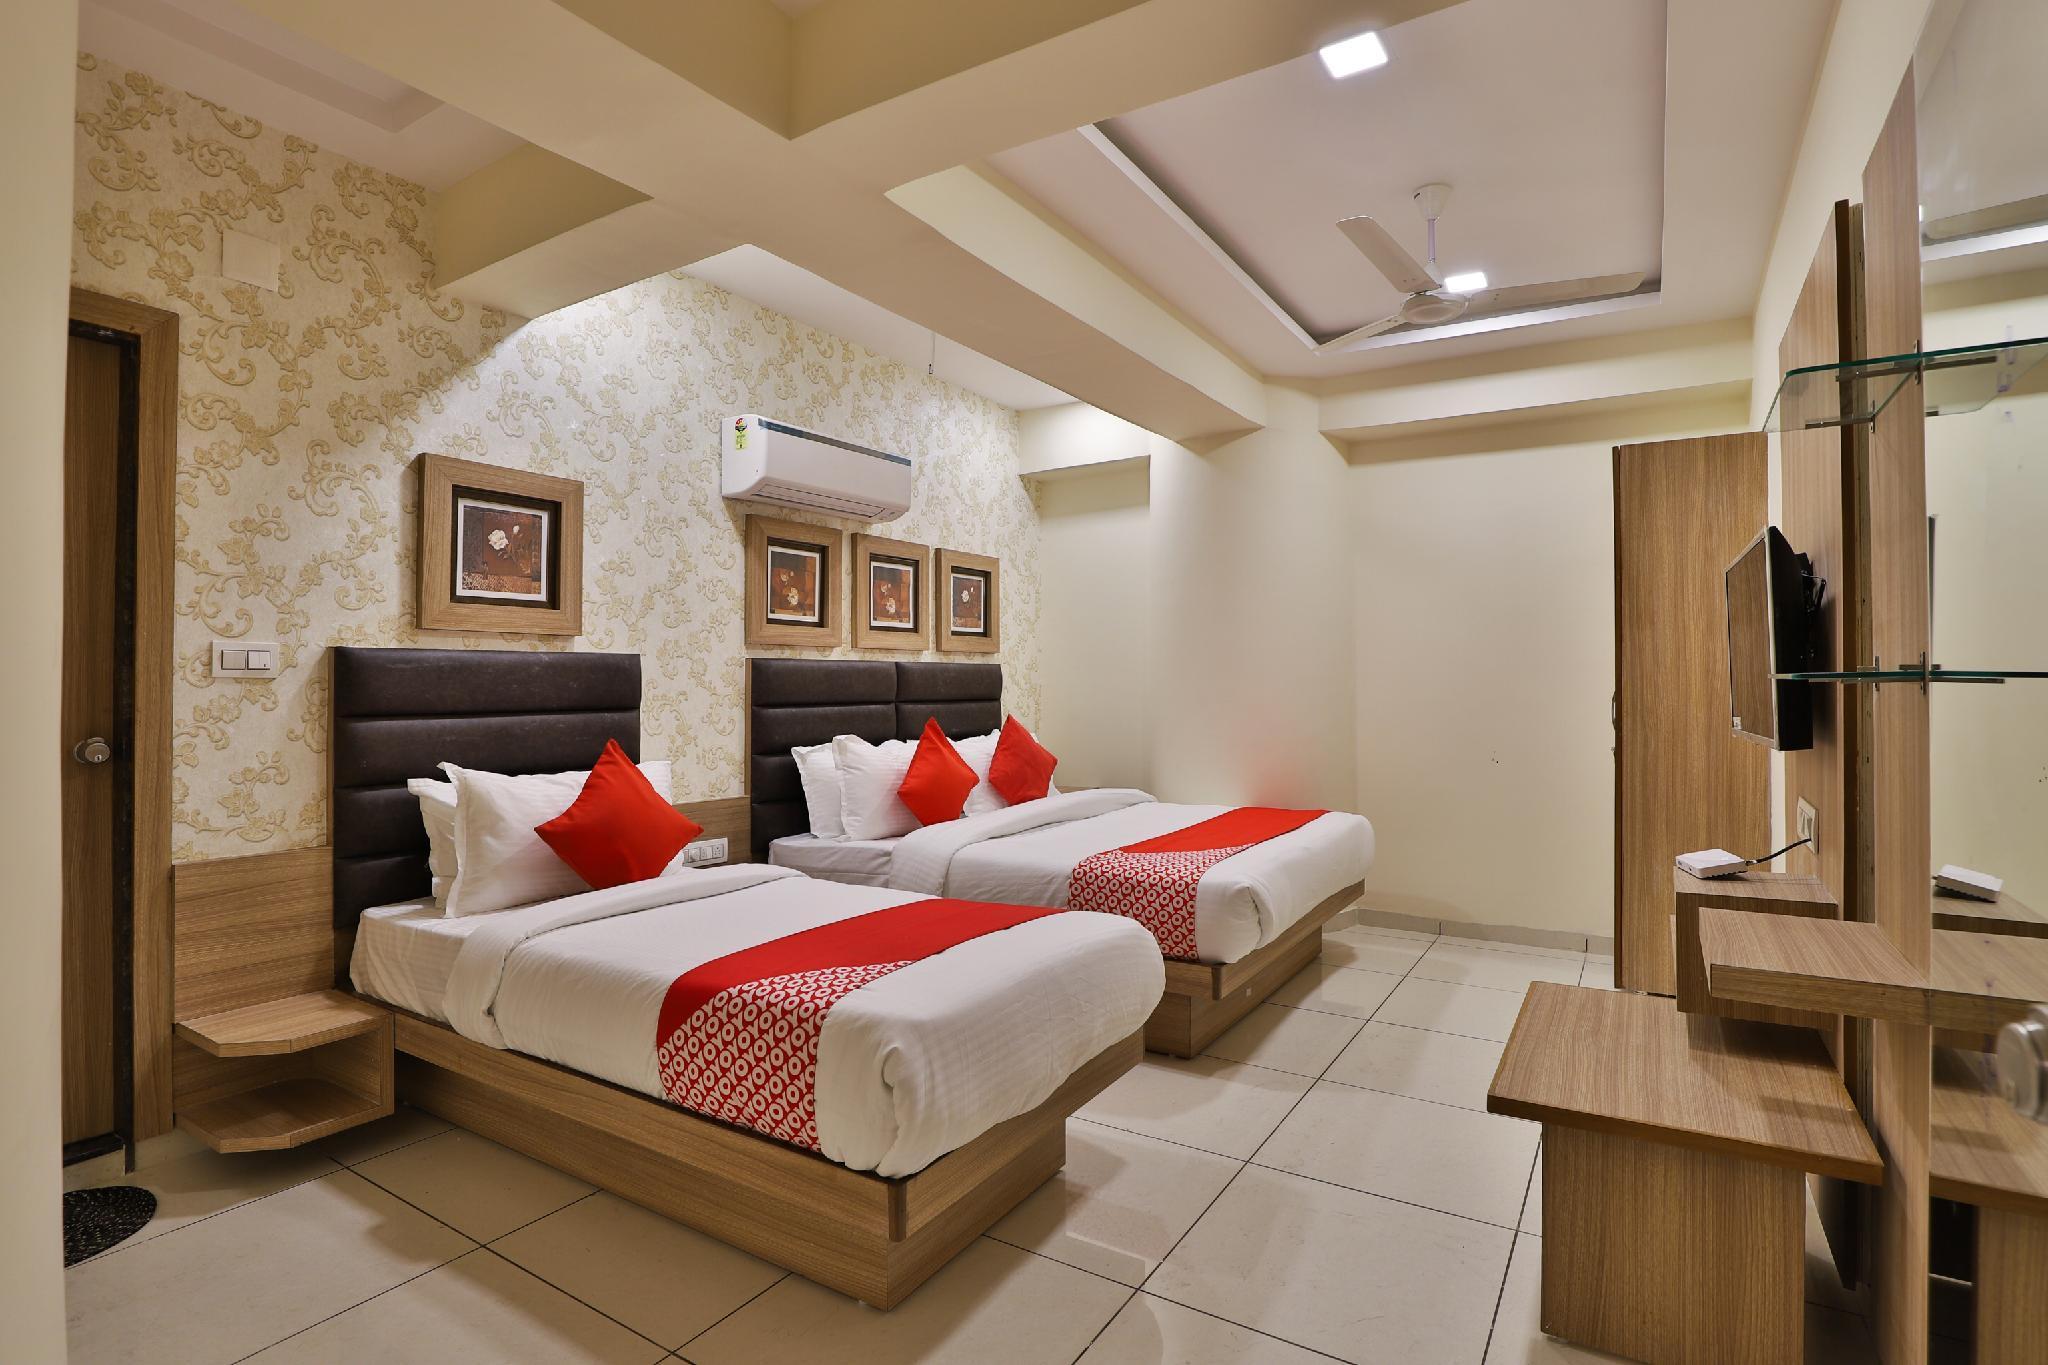 OYO 30468 Hotel Rr, Gandhinagar